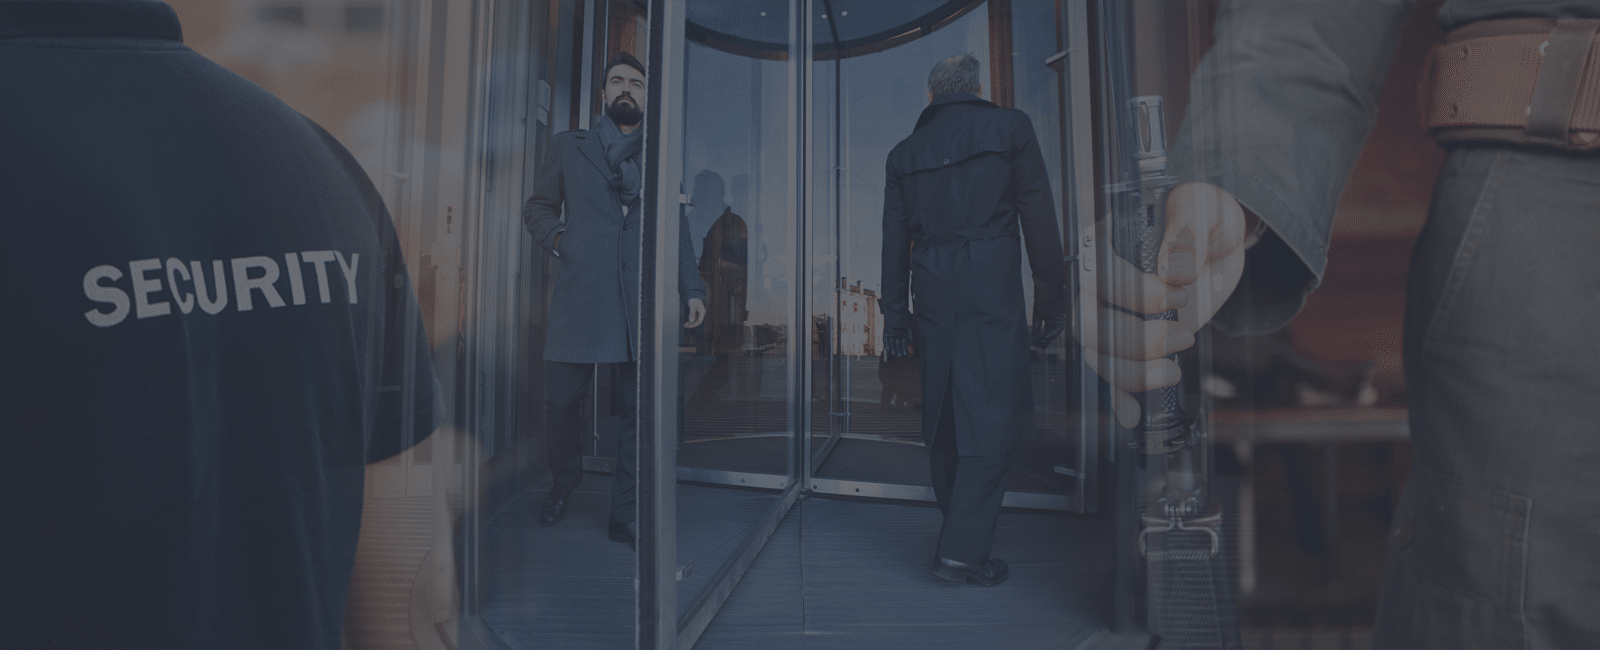 Guard-Services